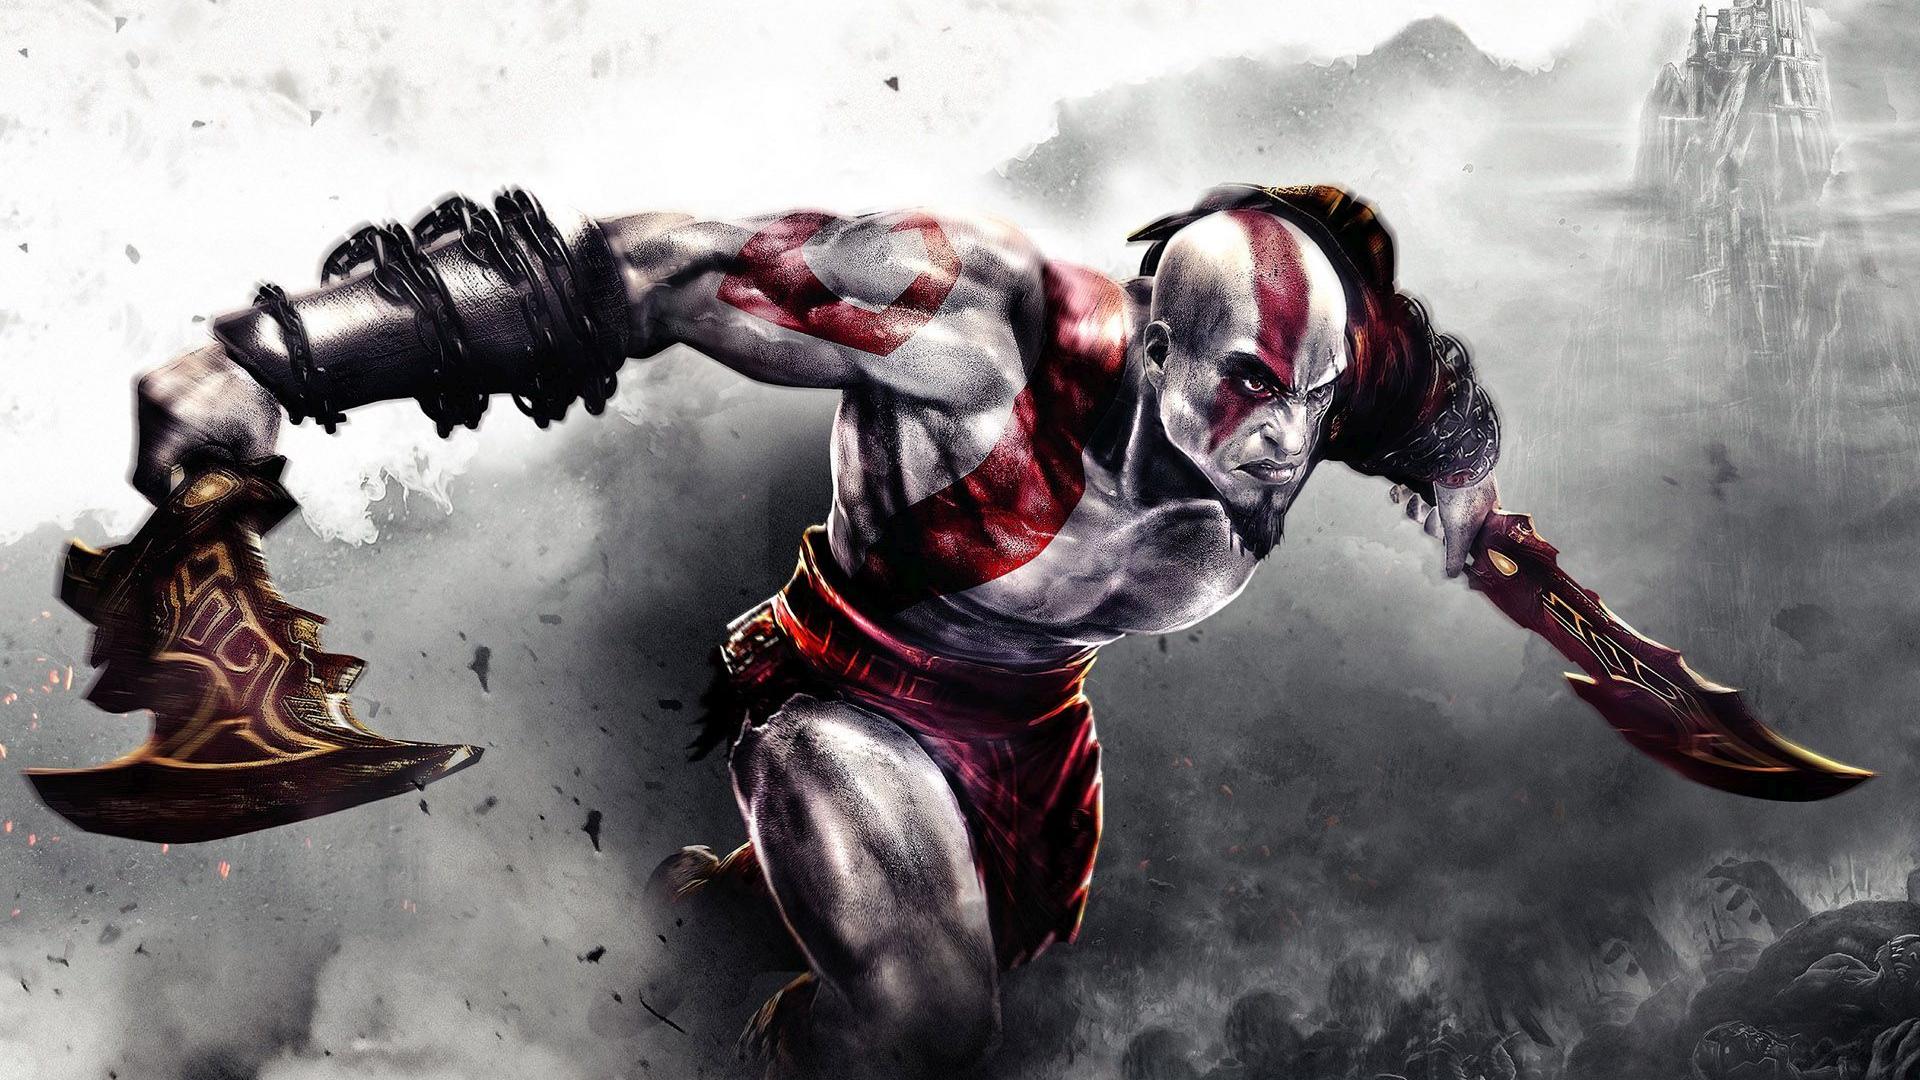 Free Download Kratos Fighting In God Of War 3 Wallpaper